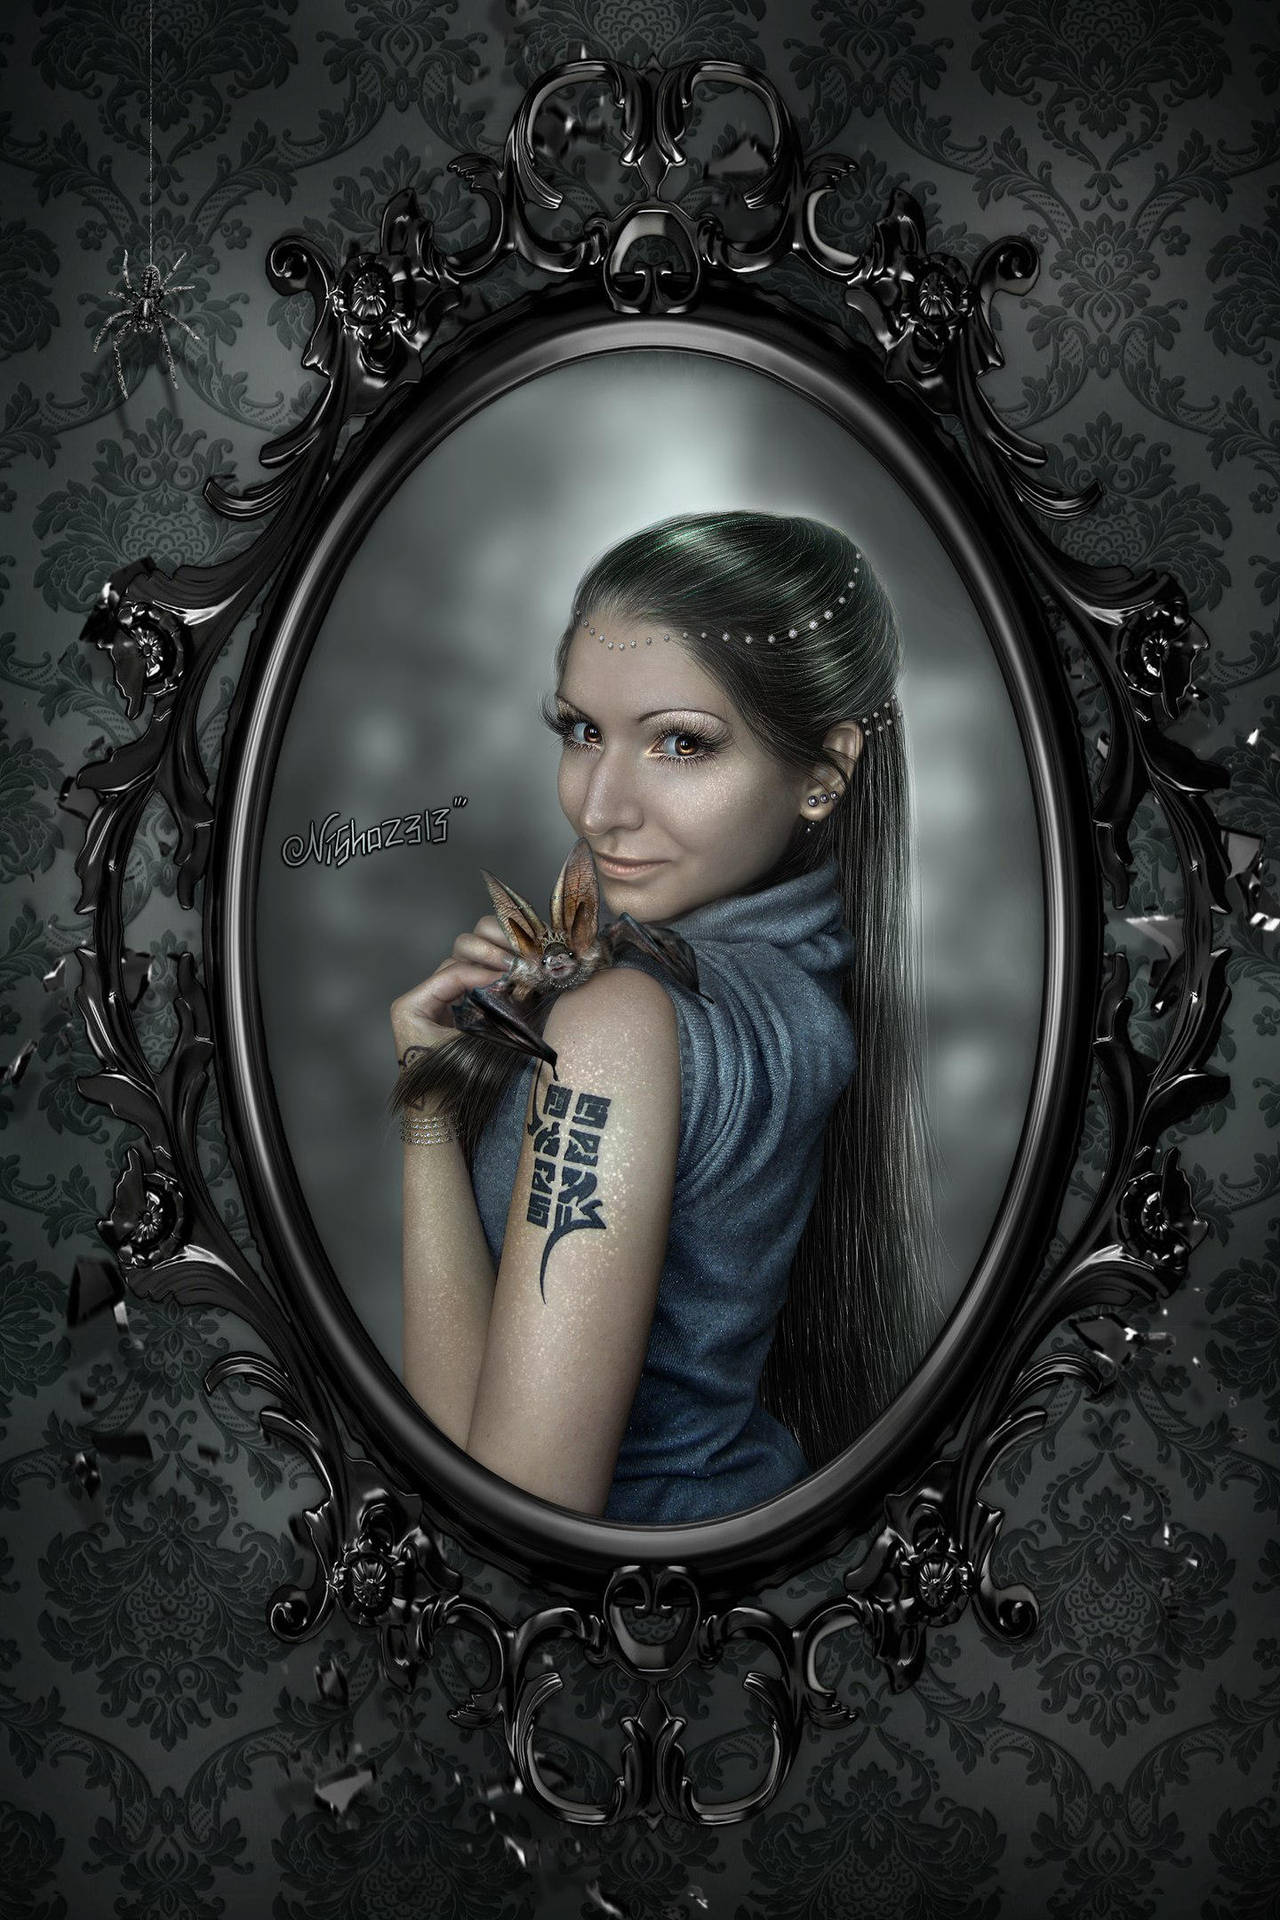 Nisha2313's Profile Picture